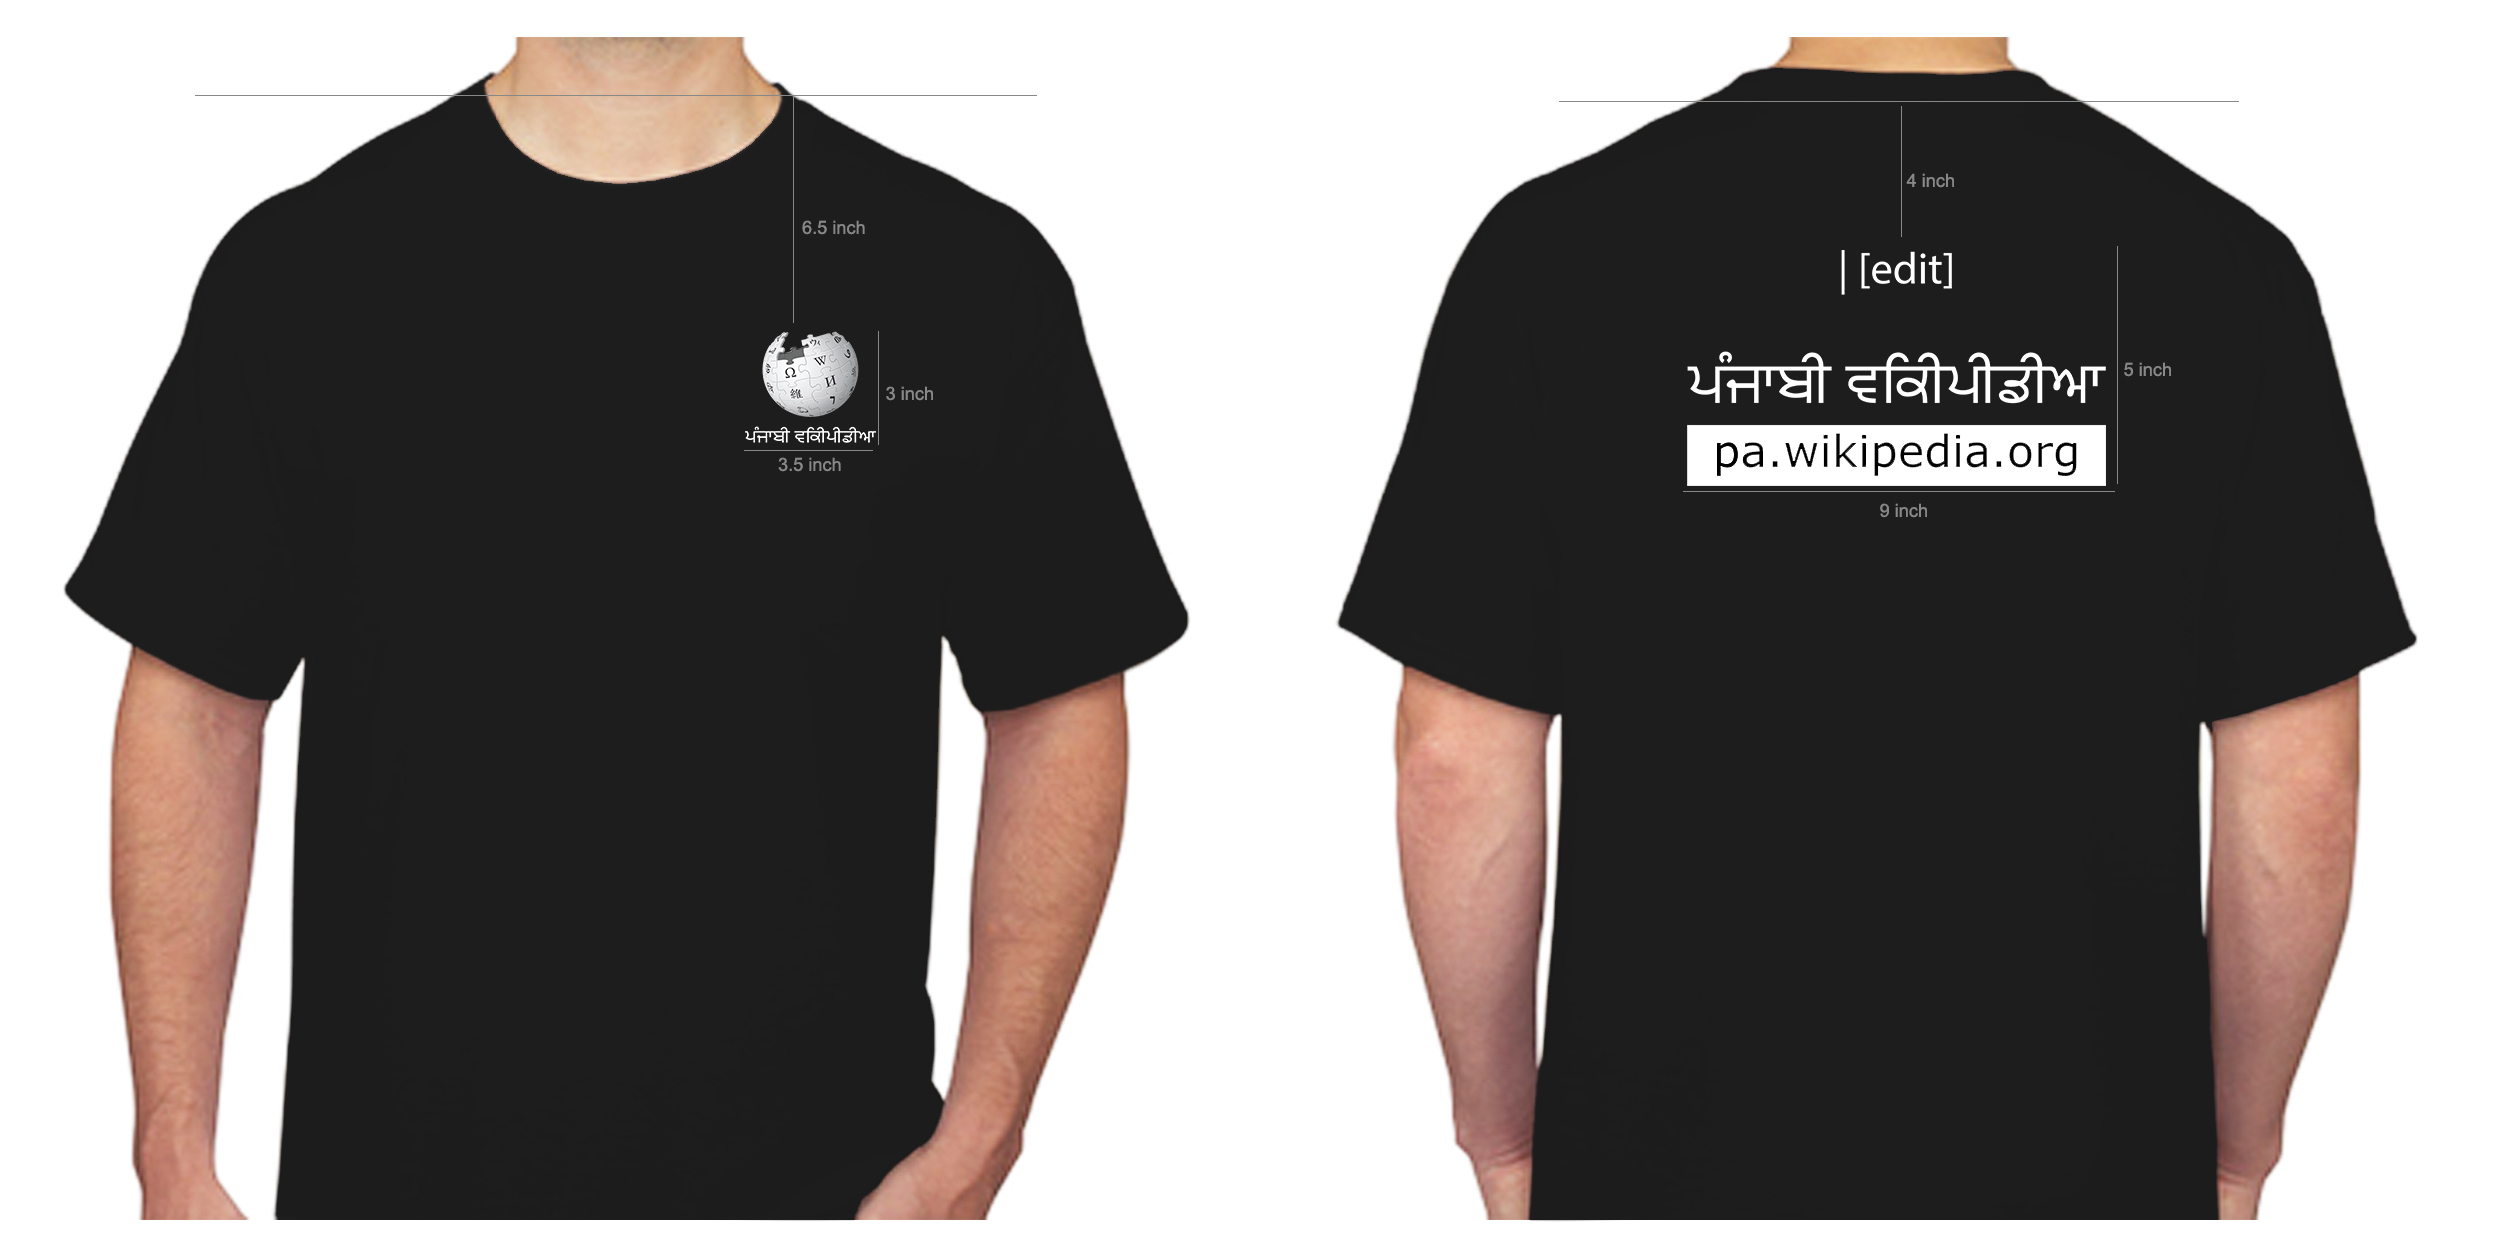 T-shirt z nadrukiem, koszulka